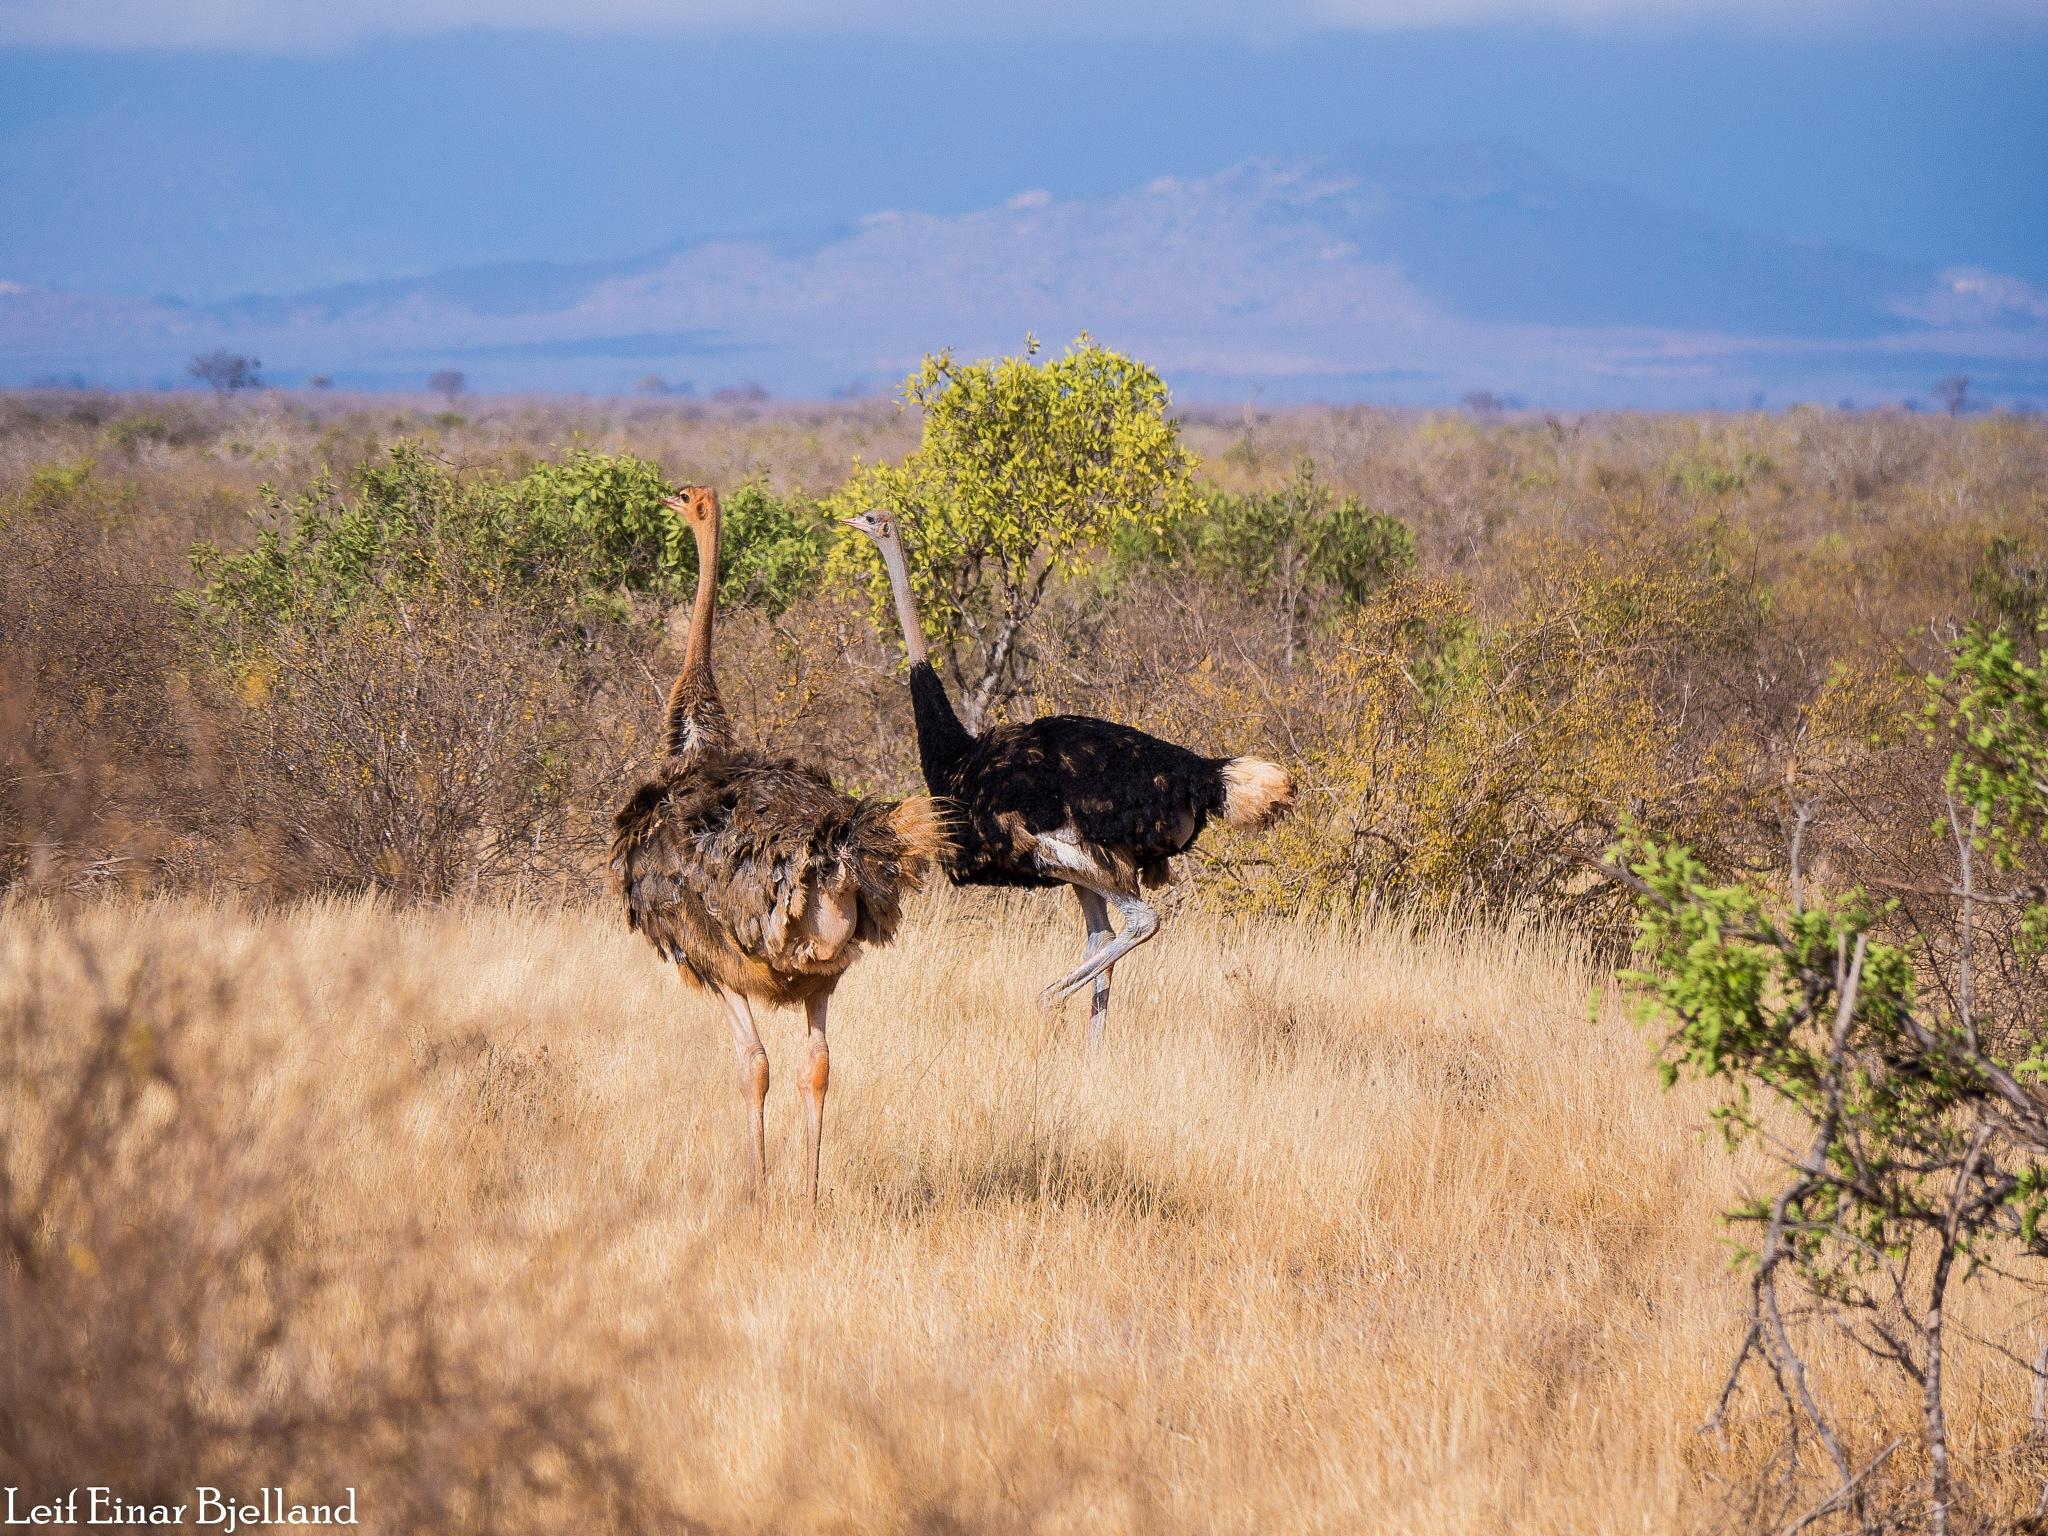 Ostriches by Leif Einar Bjelland